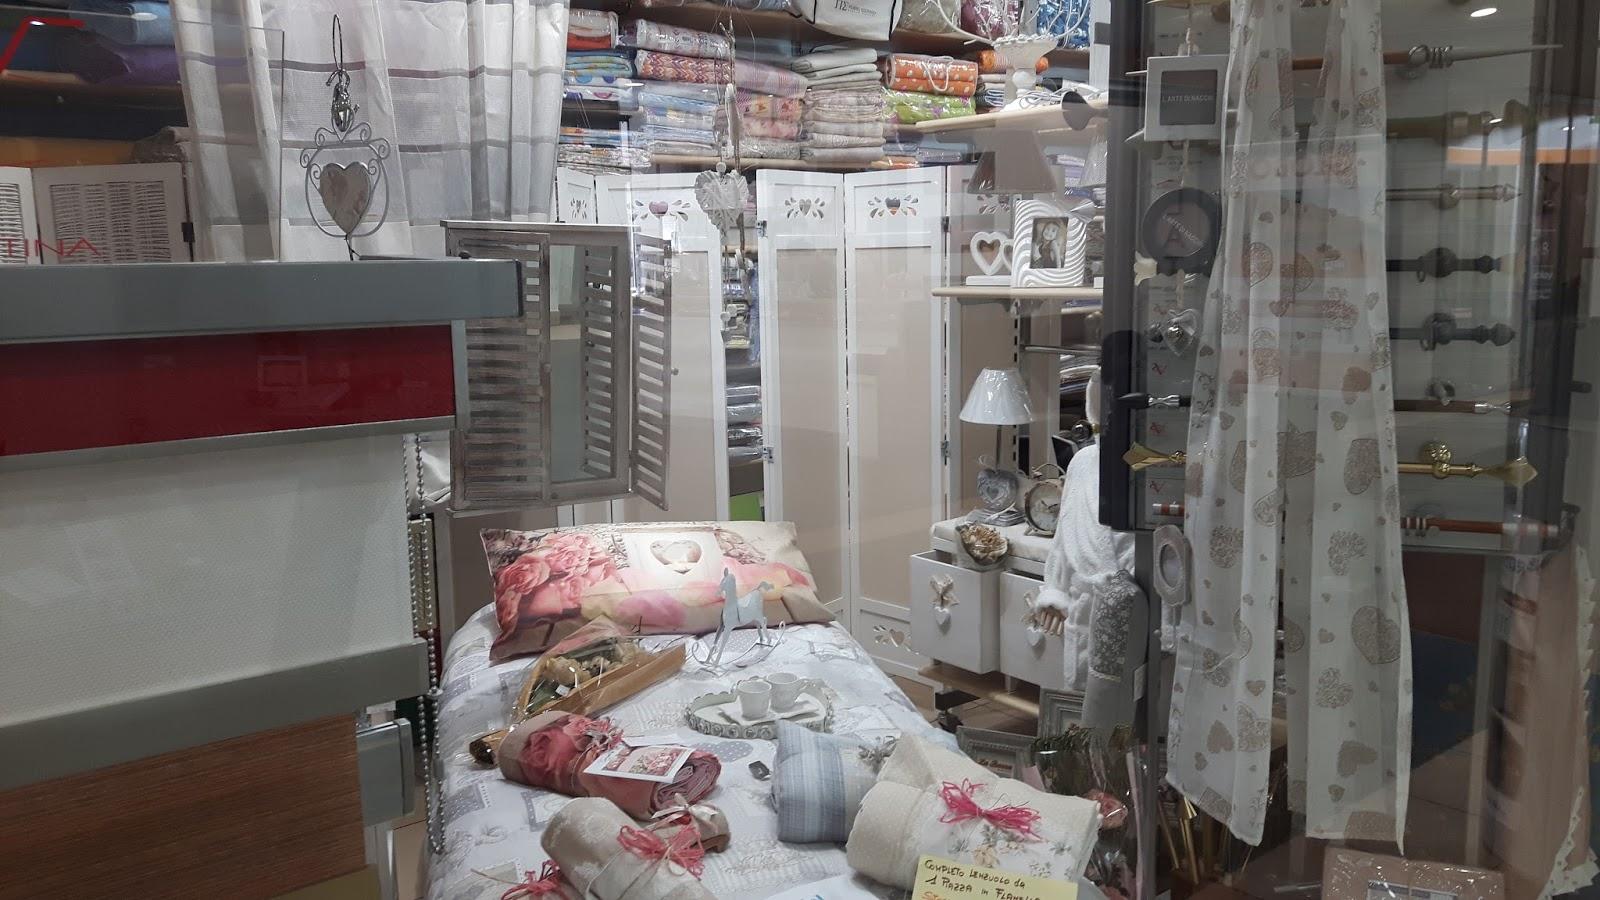 Arredamento Emilia Romagna la bazza store - lugo - ravenna - emilia romagna: shabby